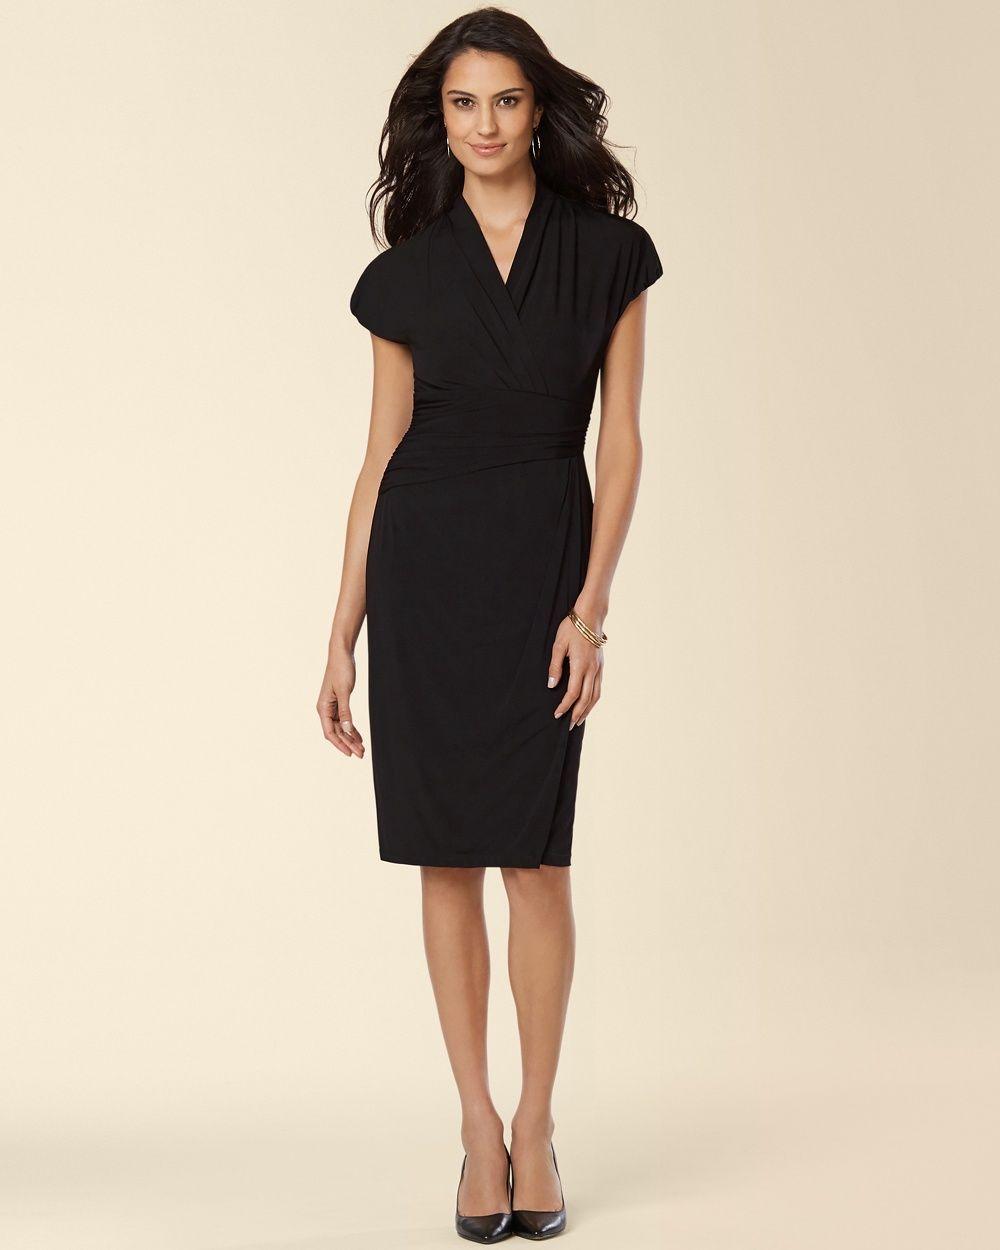 Soma Ivy and Blu Shirred Surplice Black Dress 78d3b1251